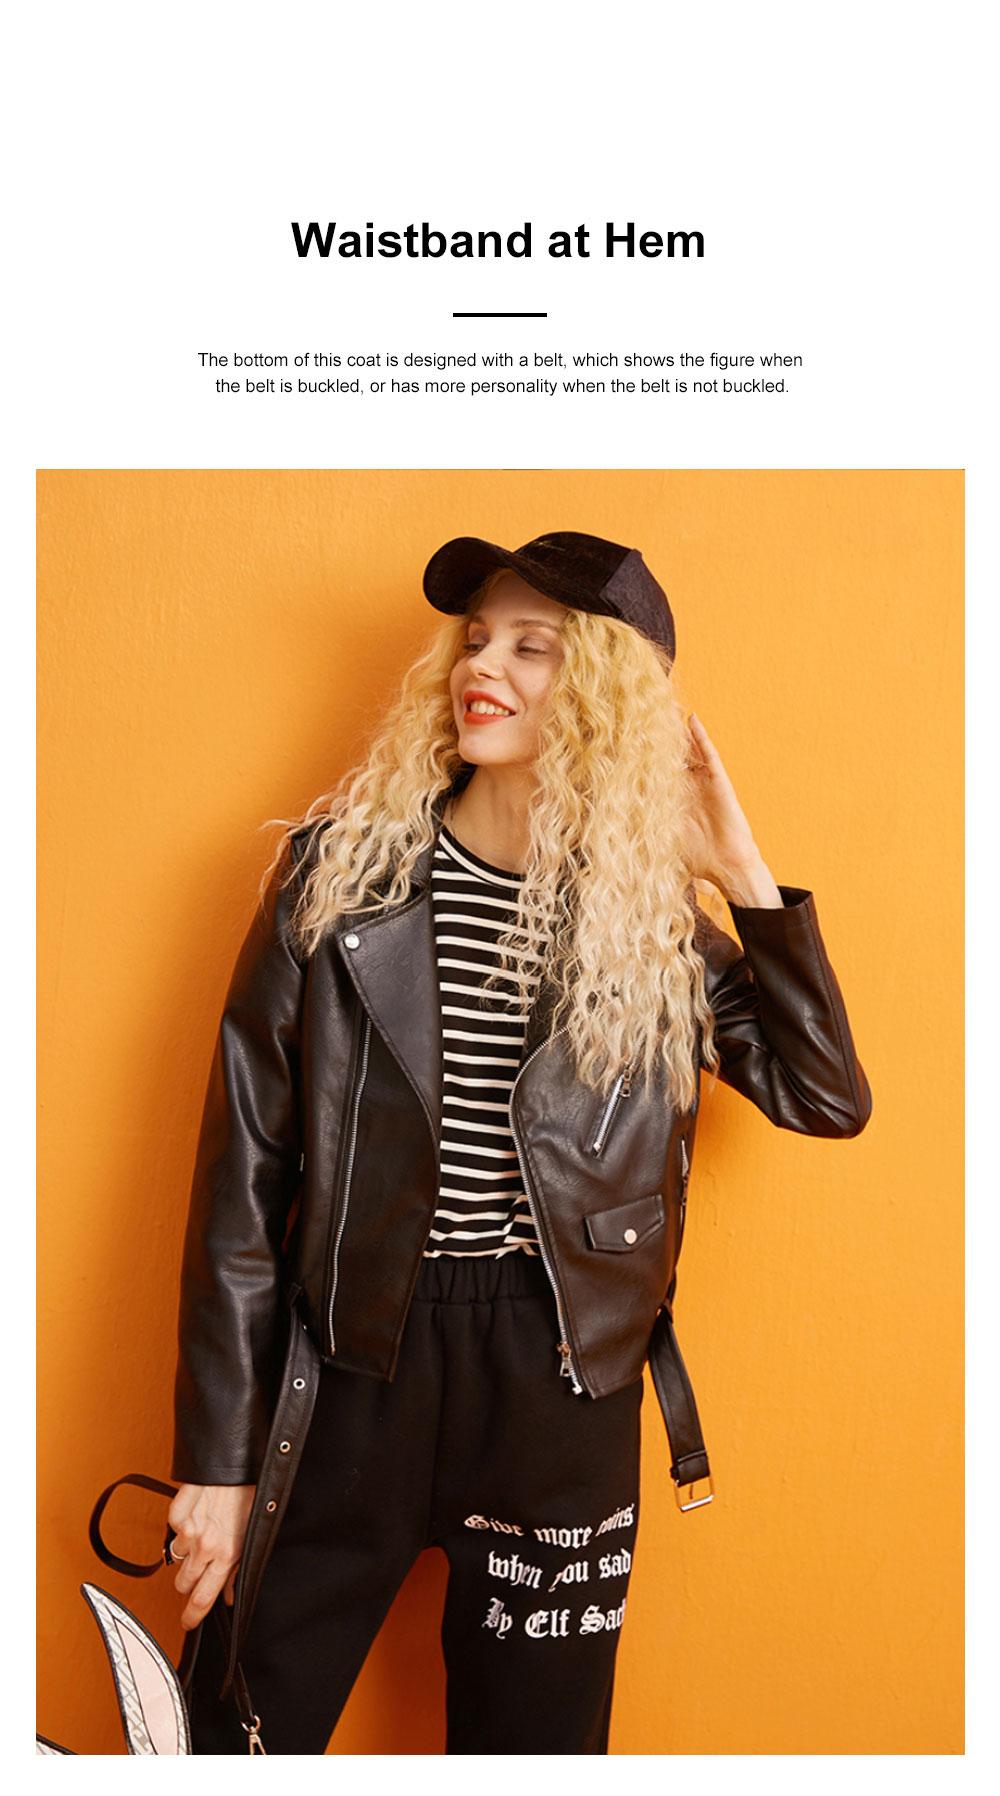 ELFSACK Short Locomotive Suit New Retro Loose Black PU Leather Top in Autumn 2019 Girls' Top Coat 1